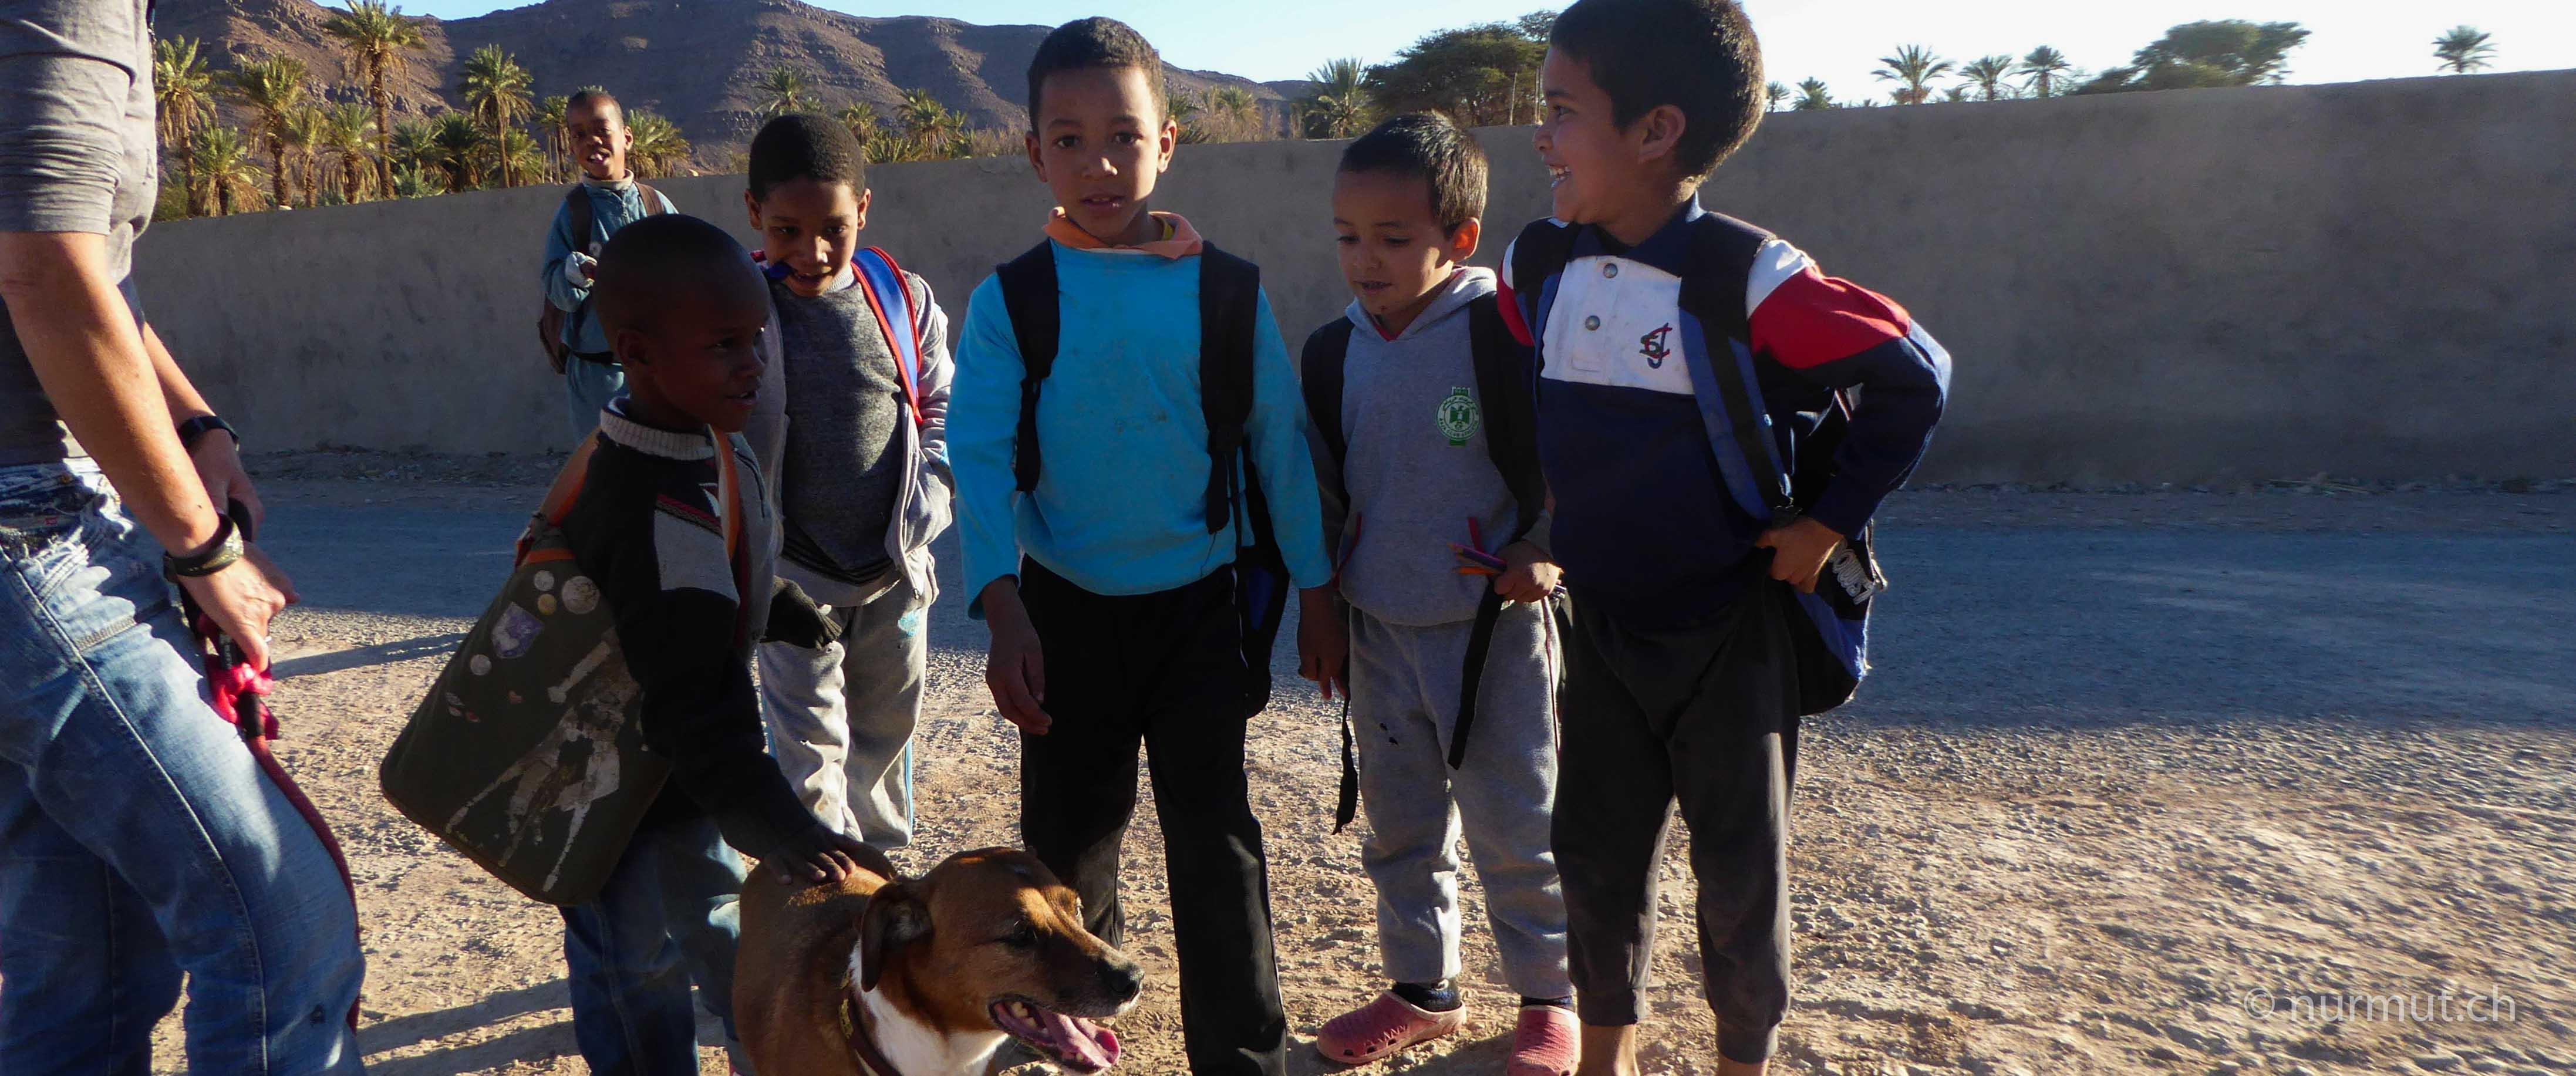 marokkoreise mit hund-marokko mit hund-marokko-infos marokko mit hund- marokkanische kinder mit hund-nurmut